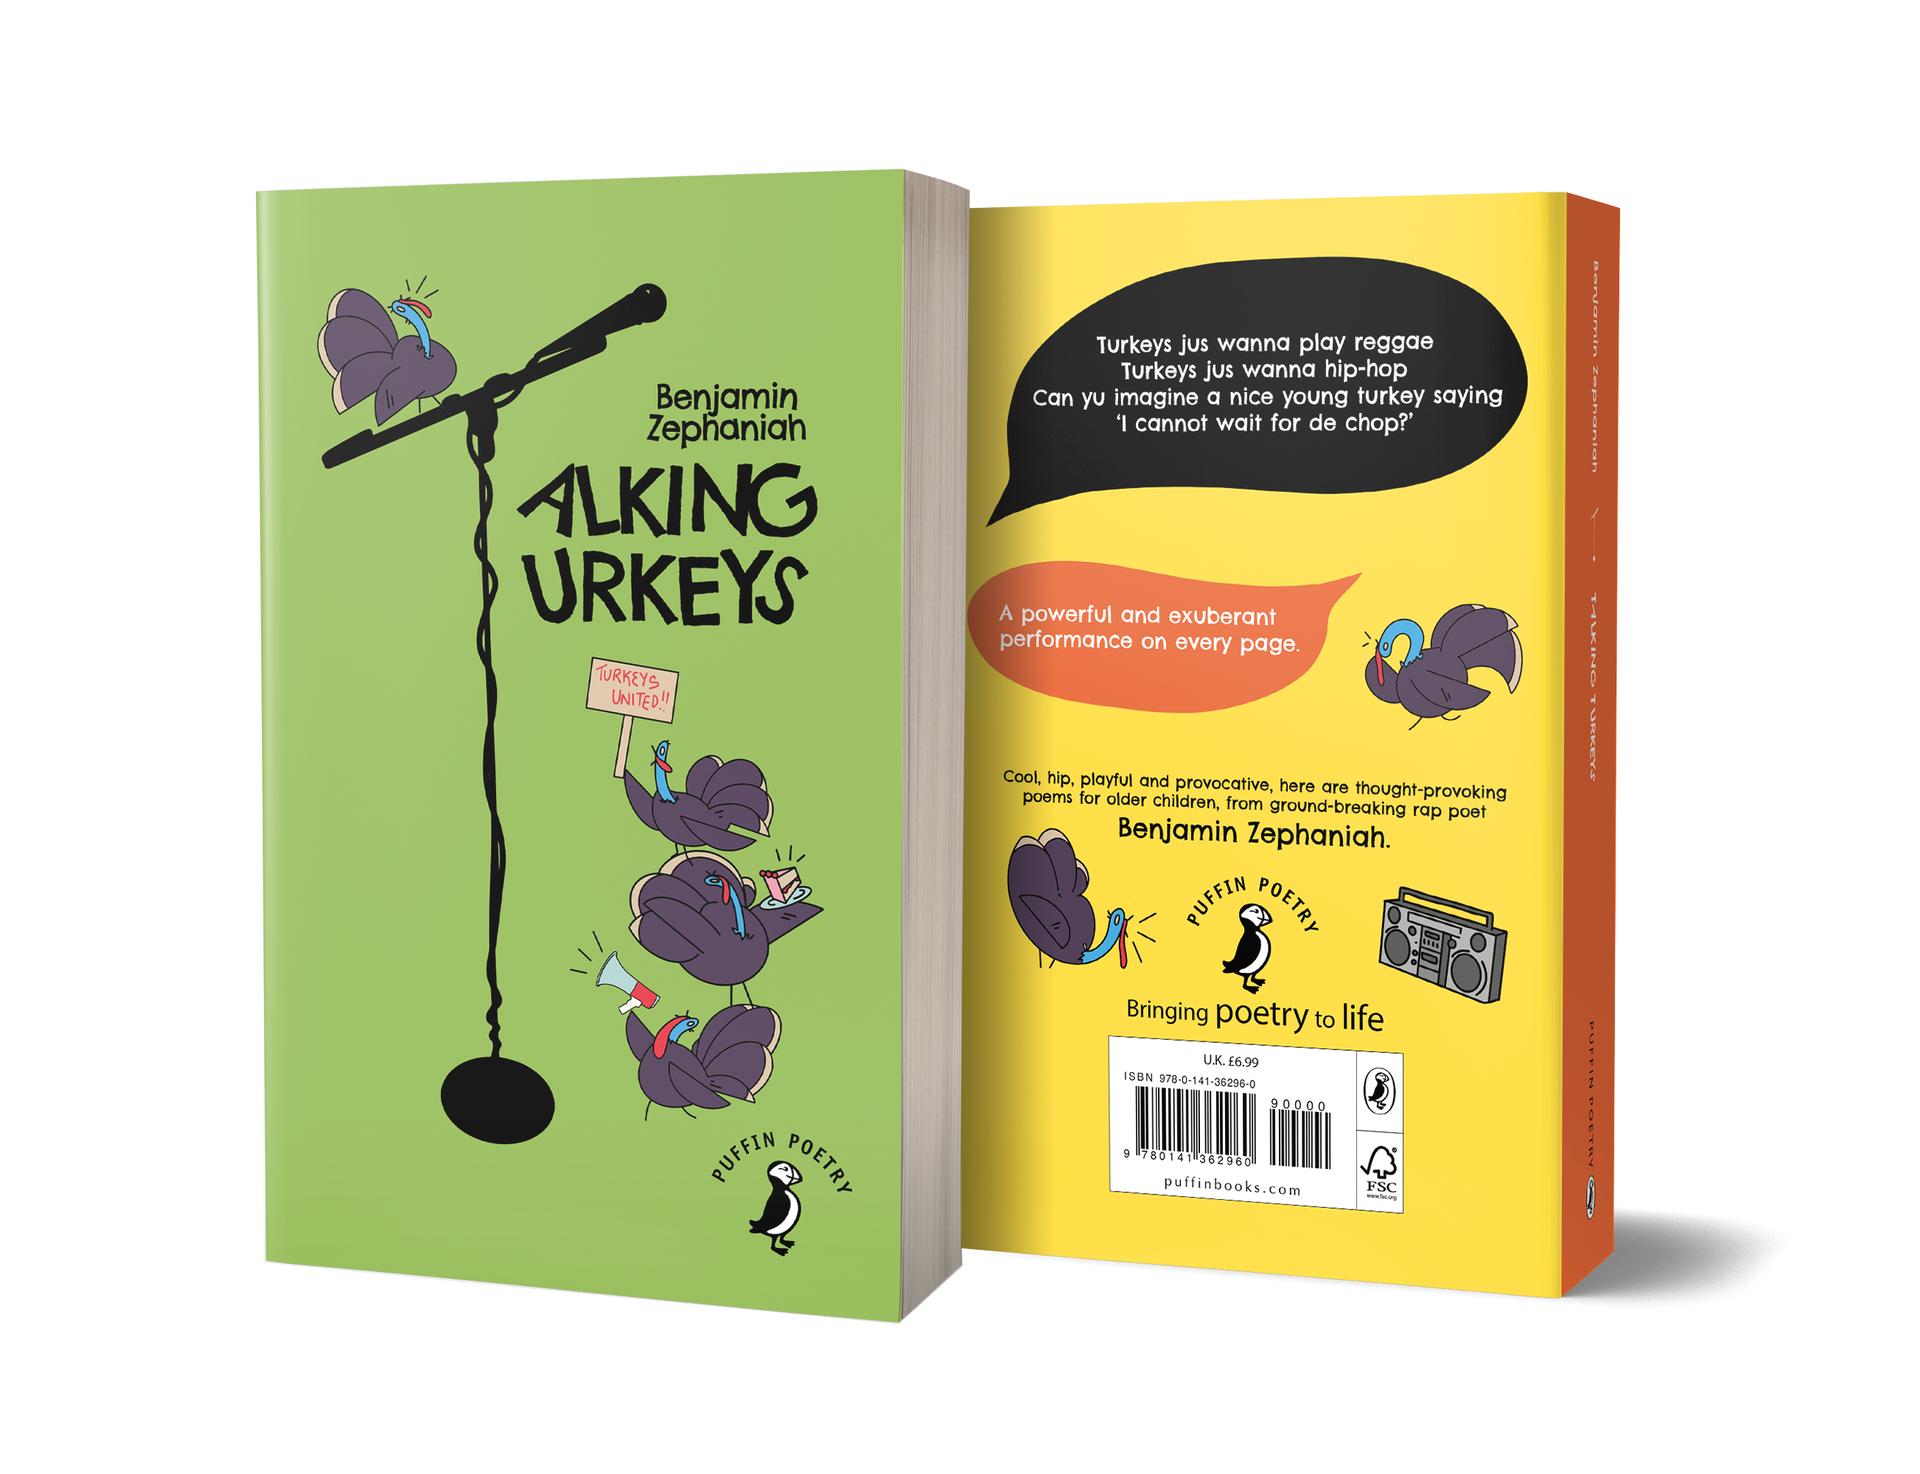 Talking Turkeys Book Cover Design, mock